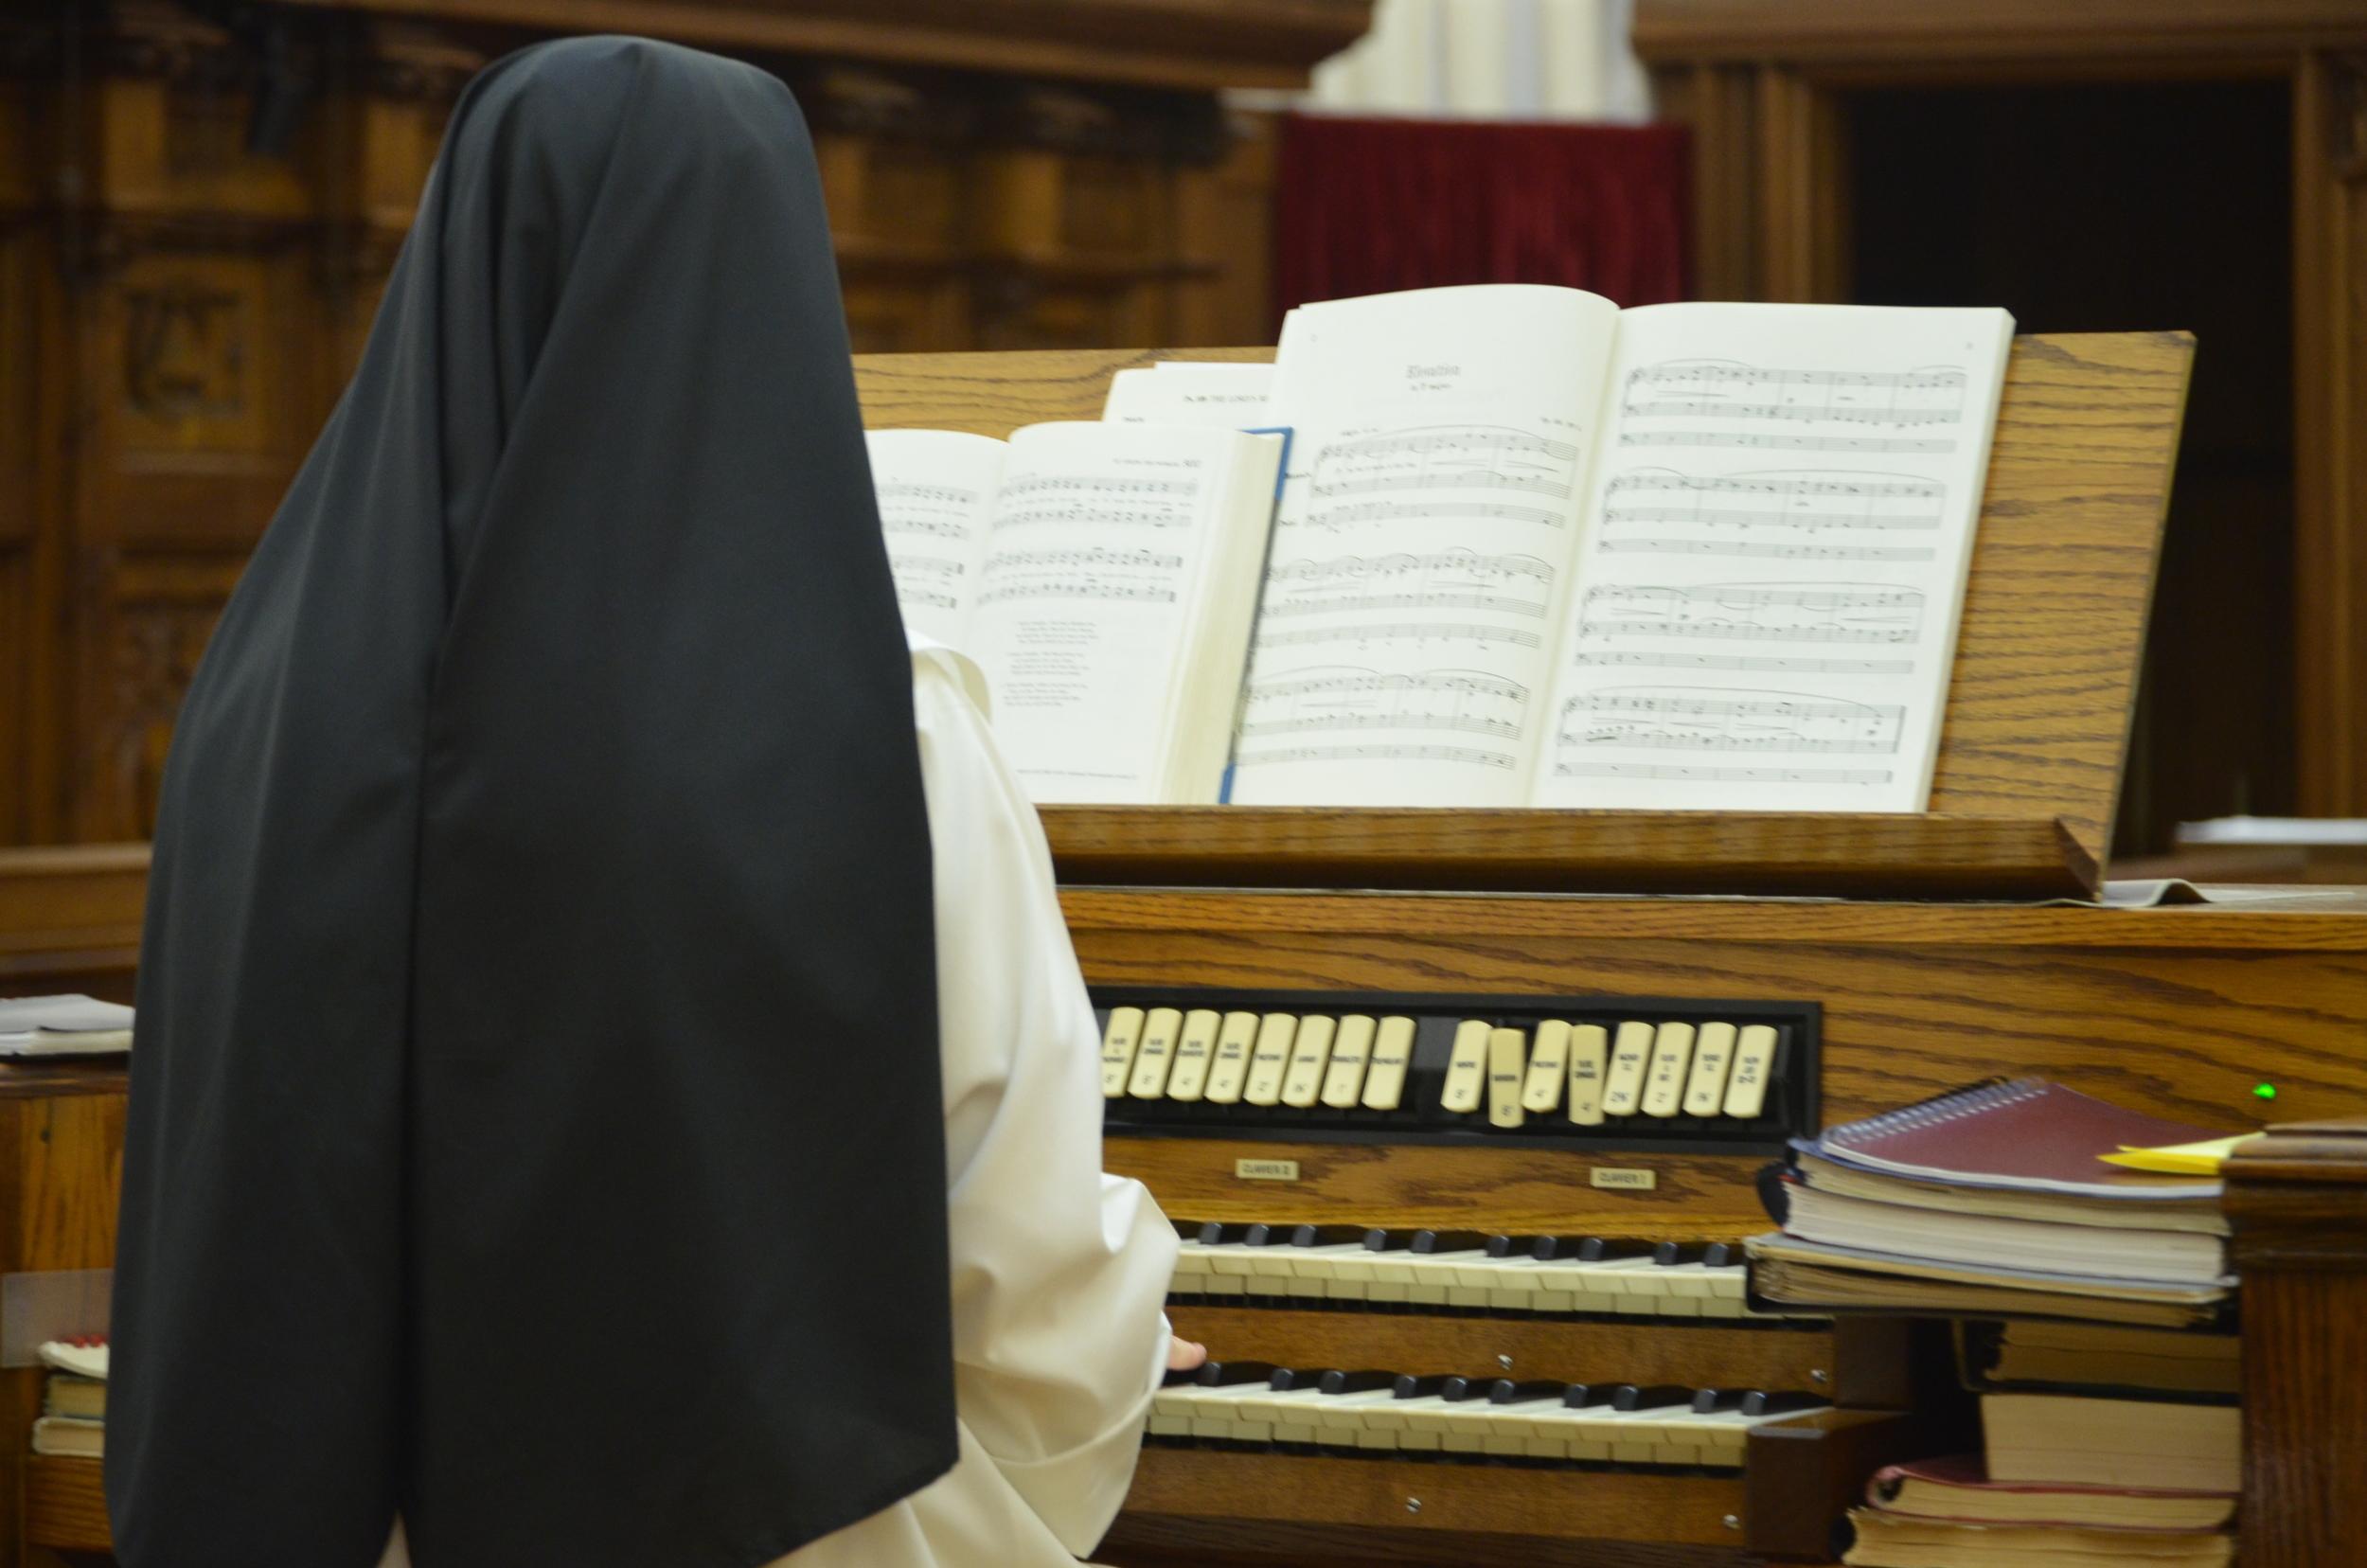 Sr. Mary Veronica at the organ